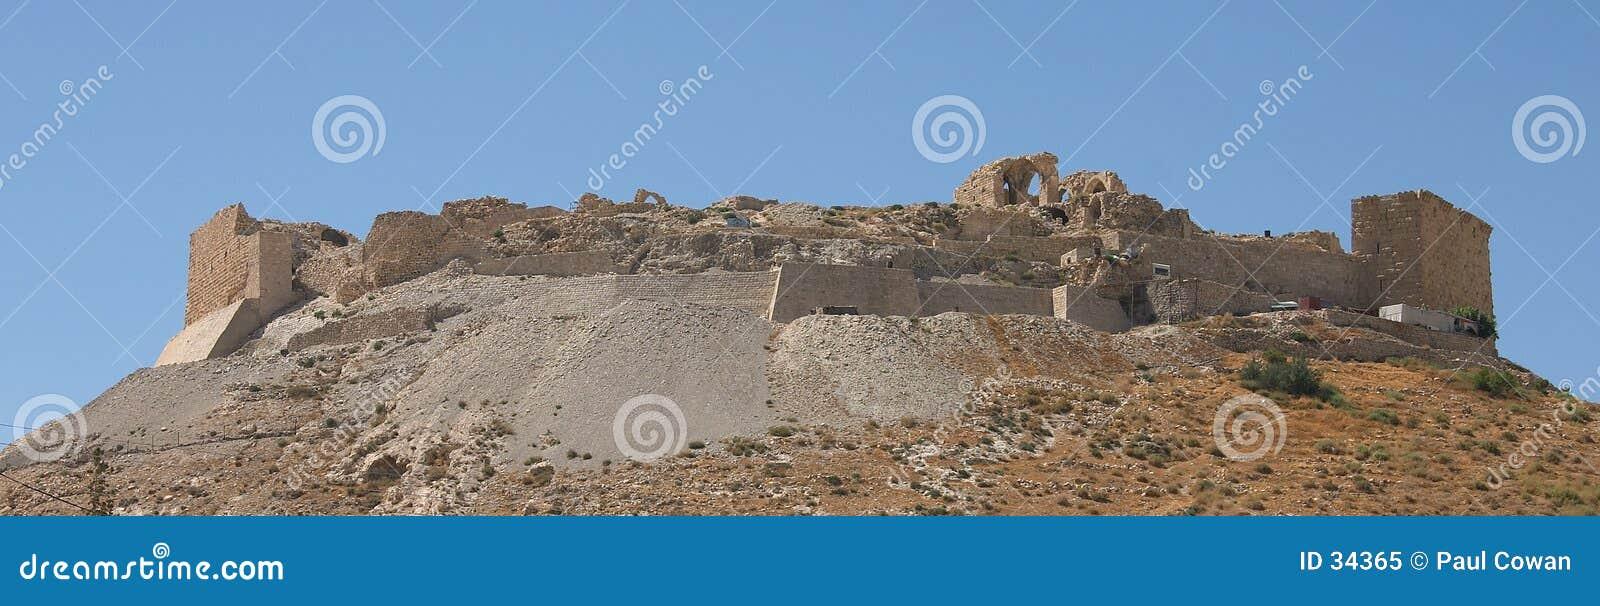 Download Castillo De Shawbak, Jordania Imagen de archivo - Imagen de jordania, hilltop: 34365